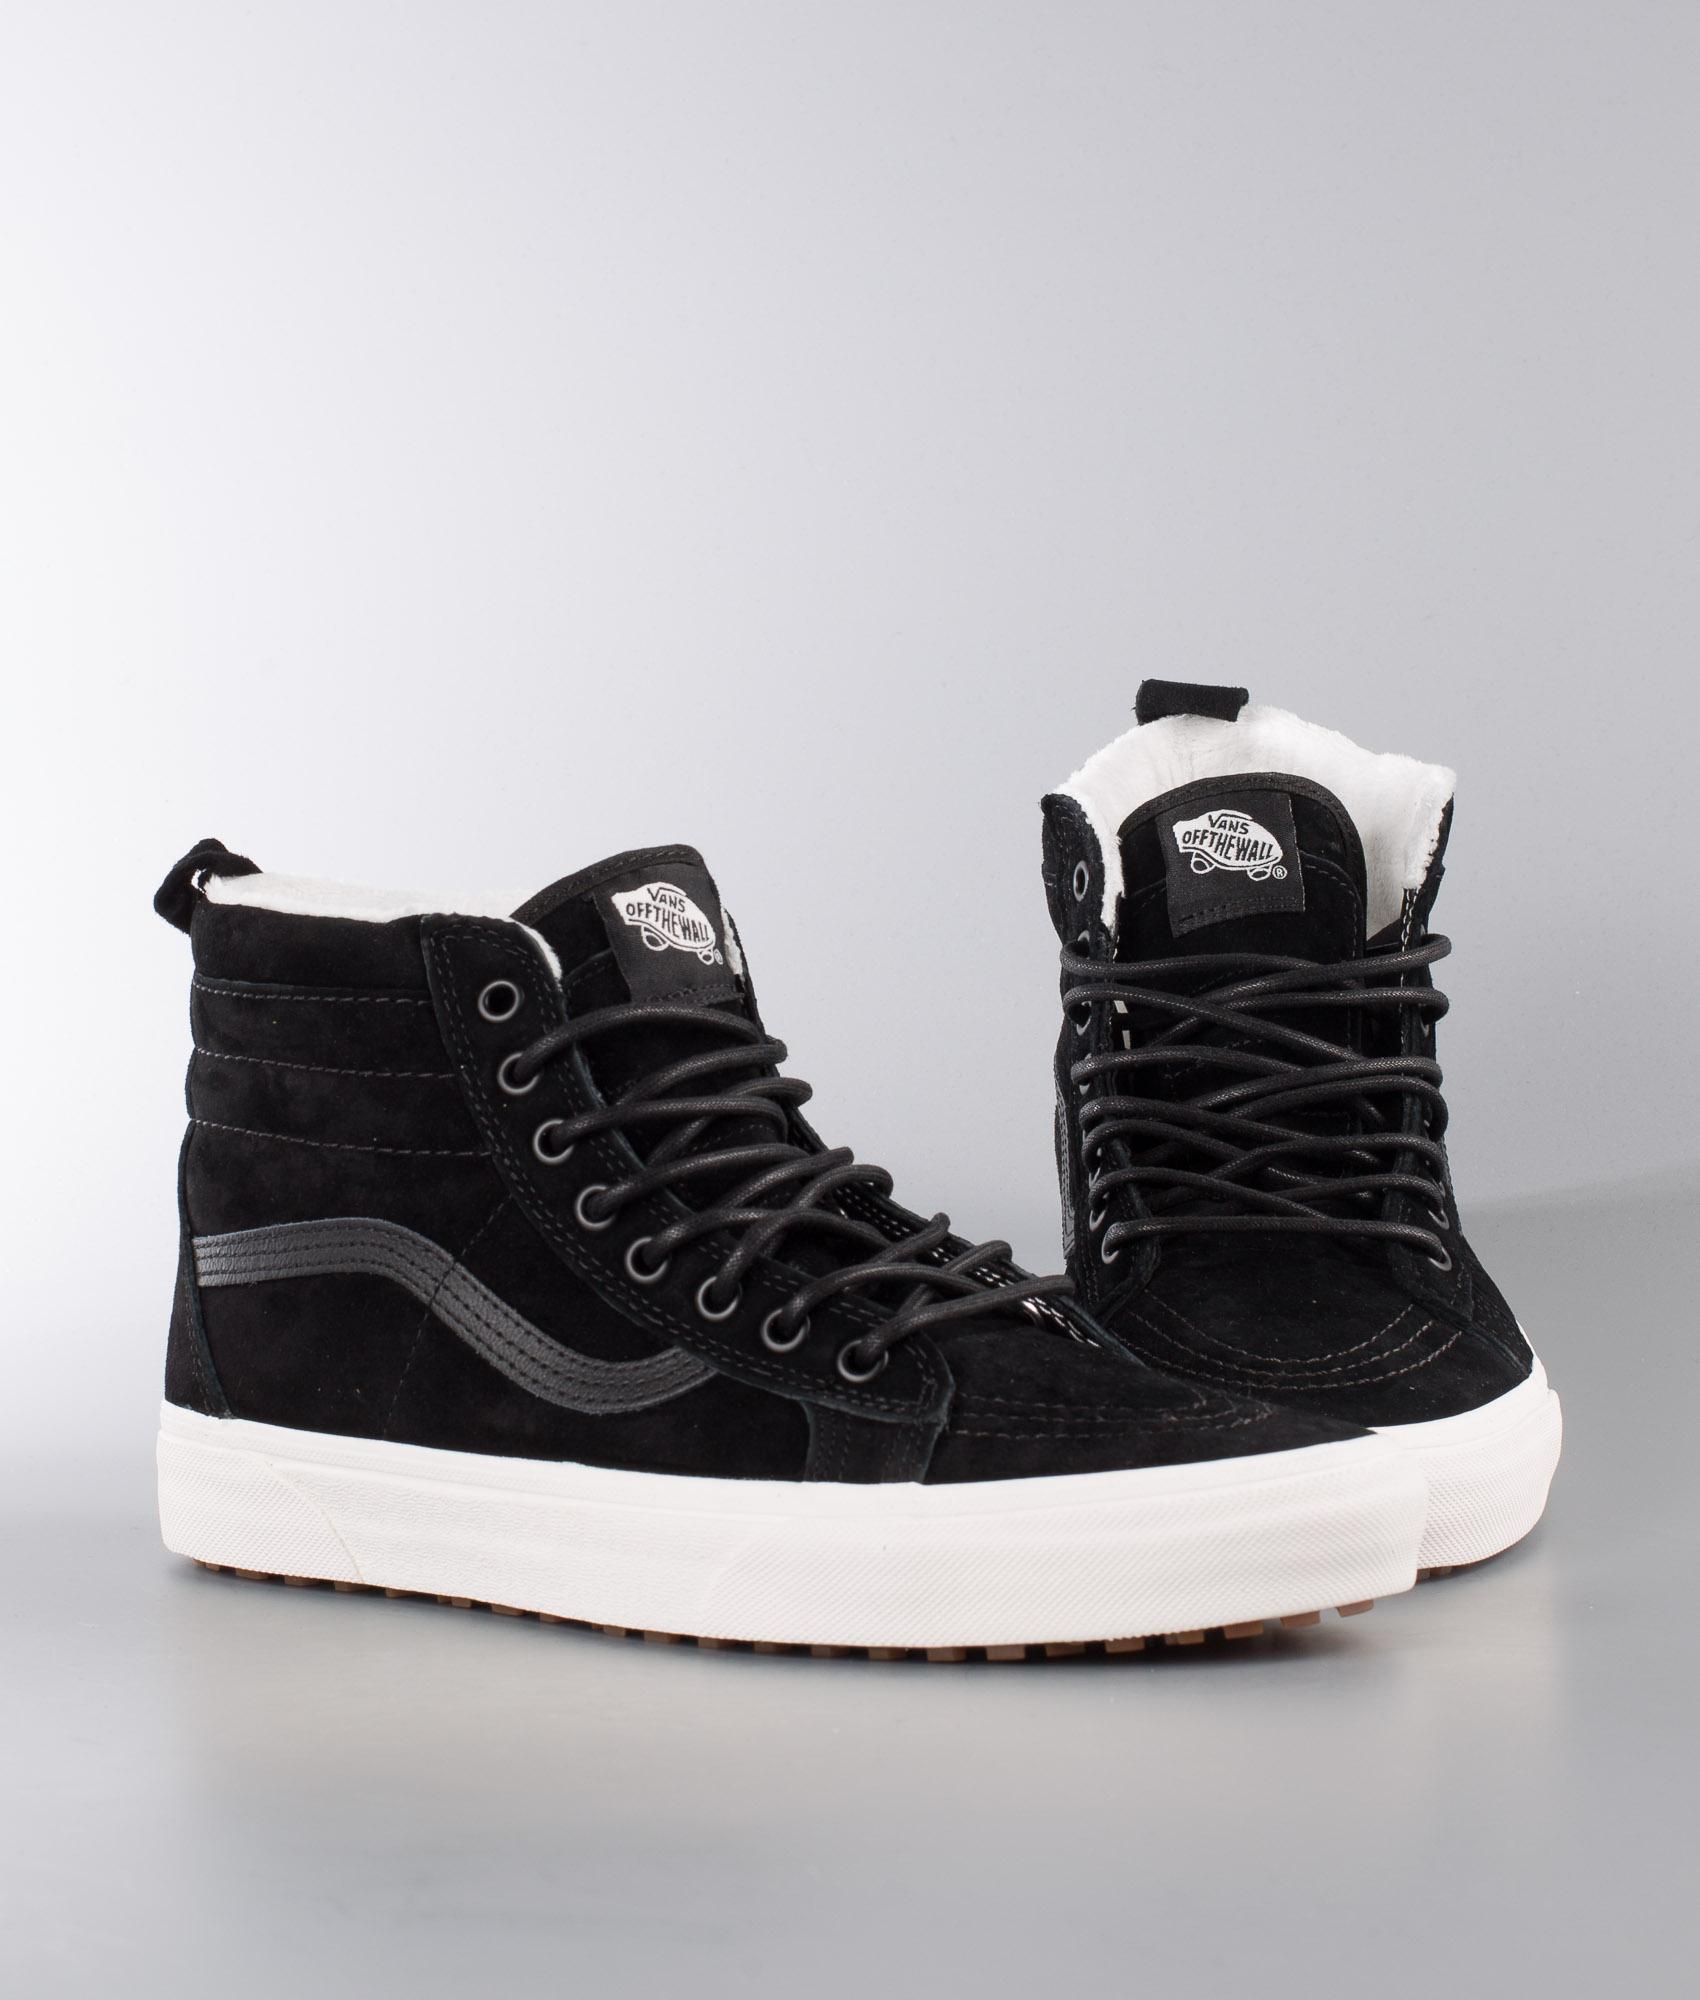 Vans Sk8-Hi Mte Shoes (Mte) Black/Black/Marshmallow